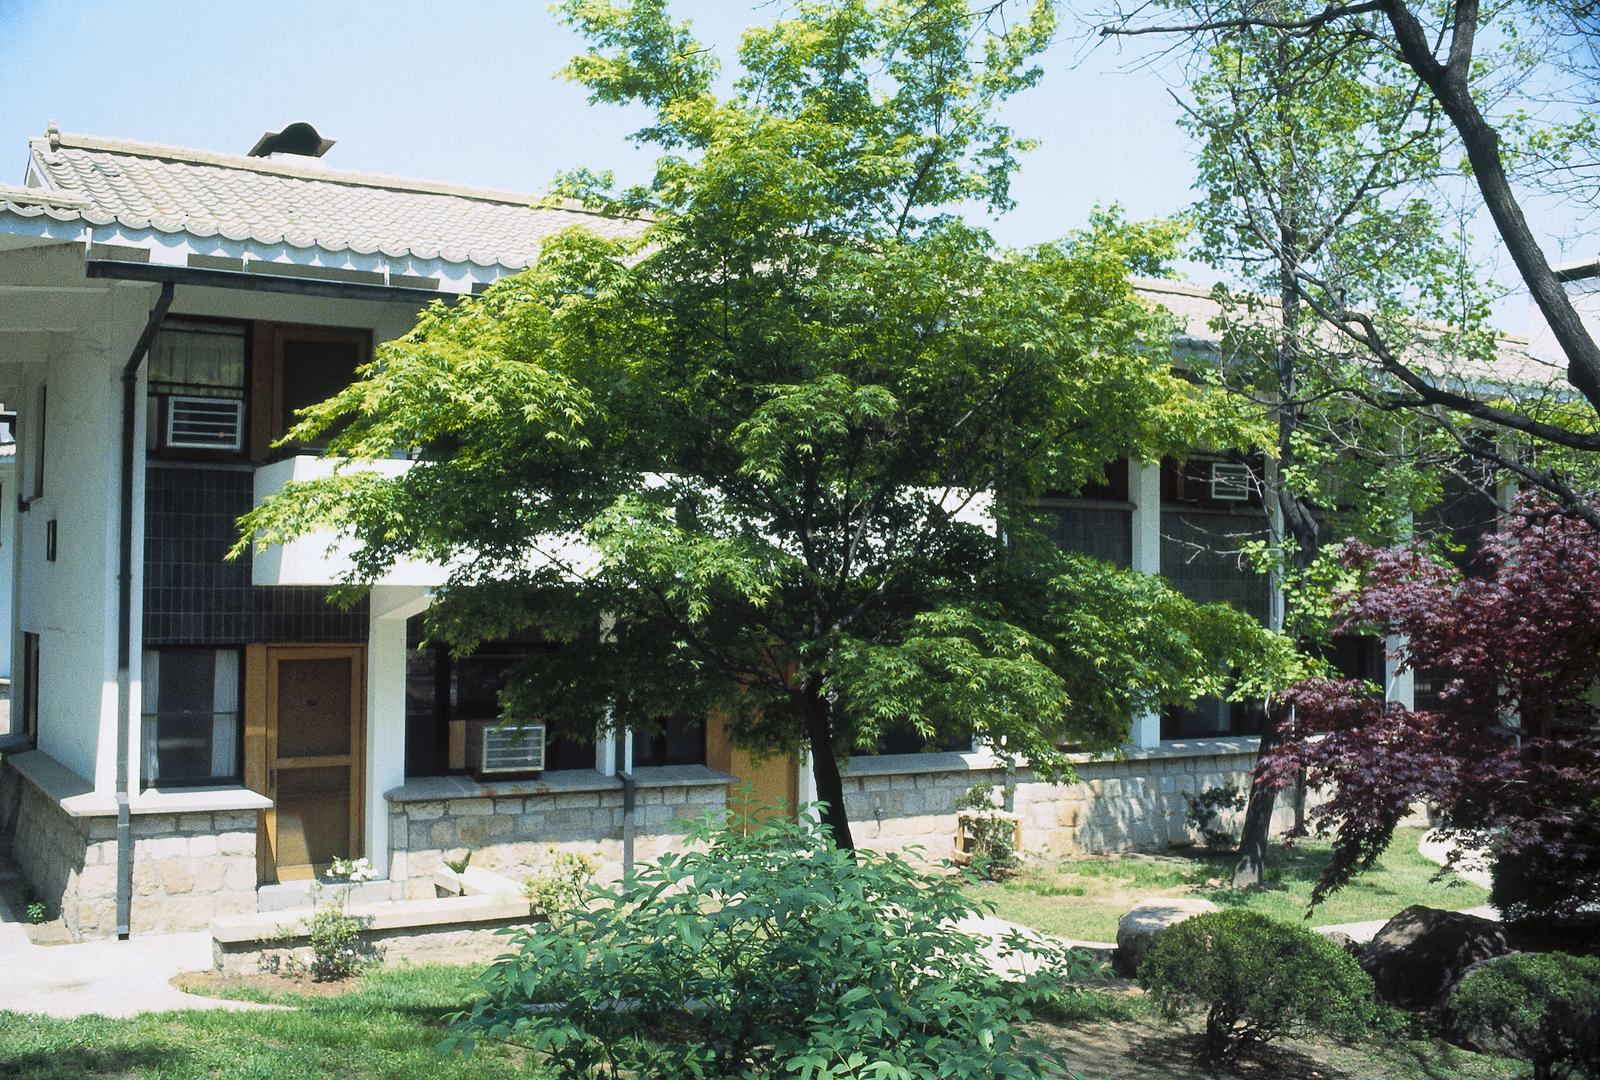 Seoul - Multi-Unit Residential Building - 1979